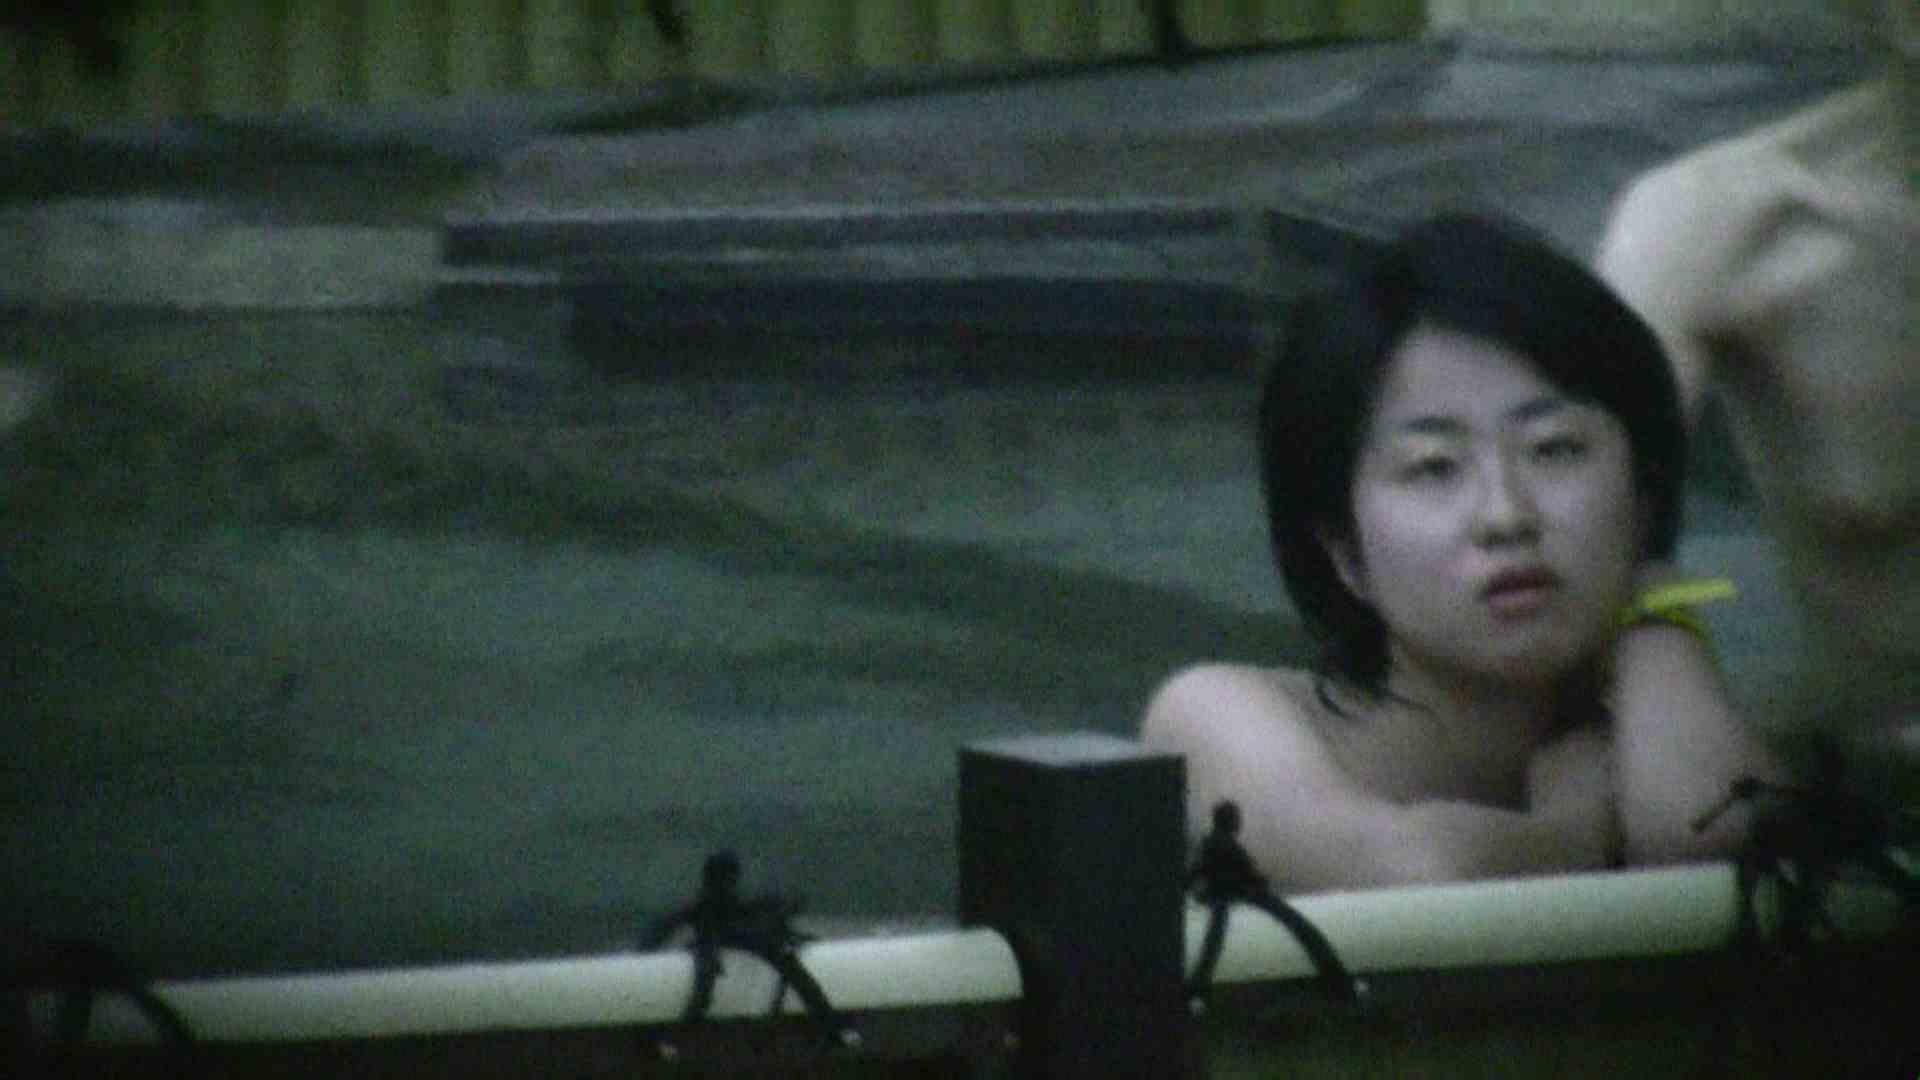 Aquaな露天風呂Vol.112 盗撮シリーズ   露天風呂編  93PIX 65